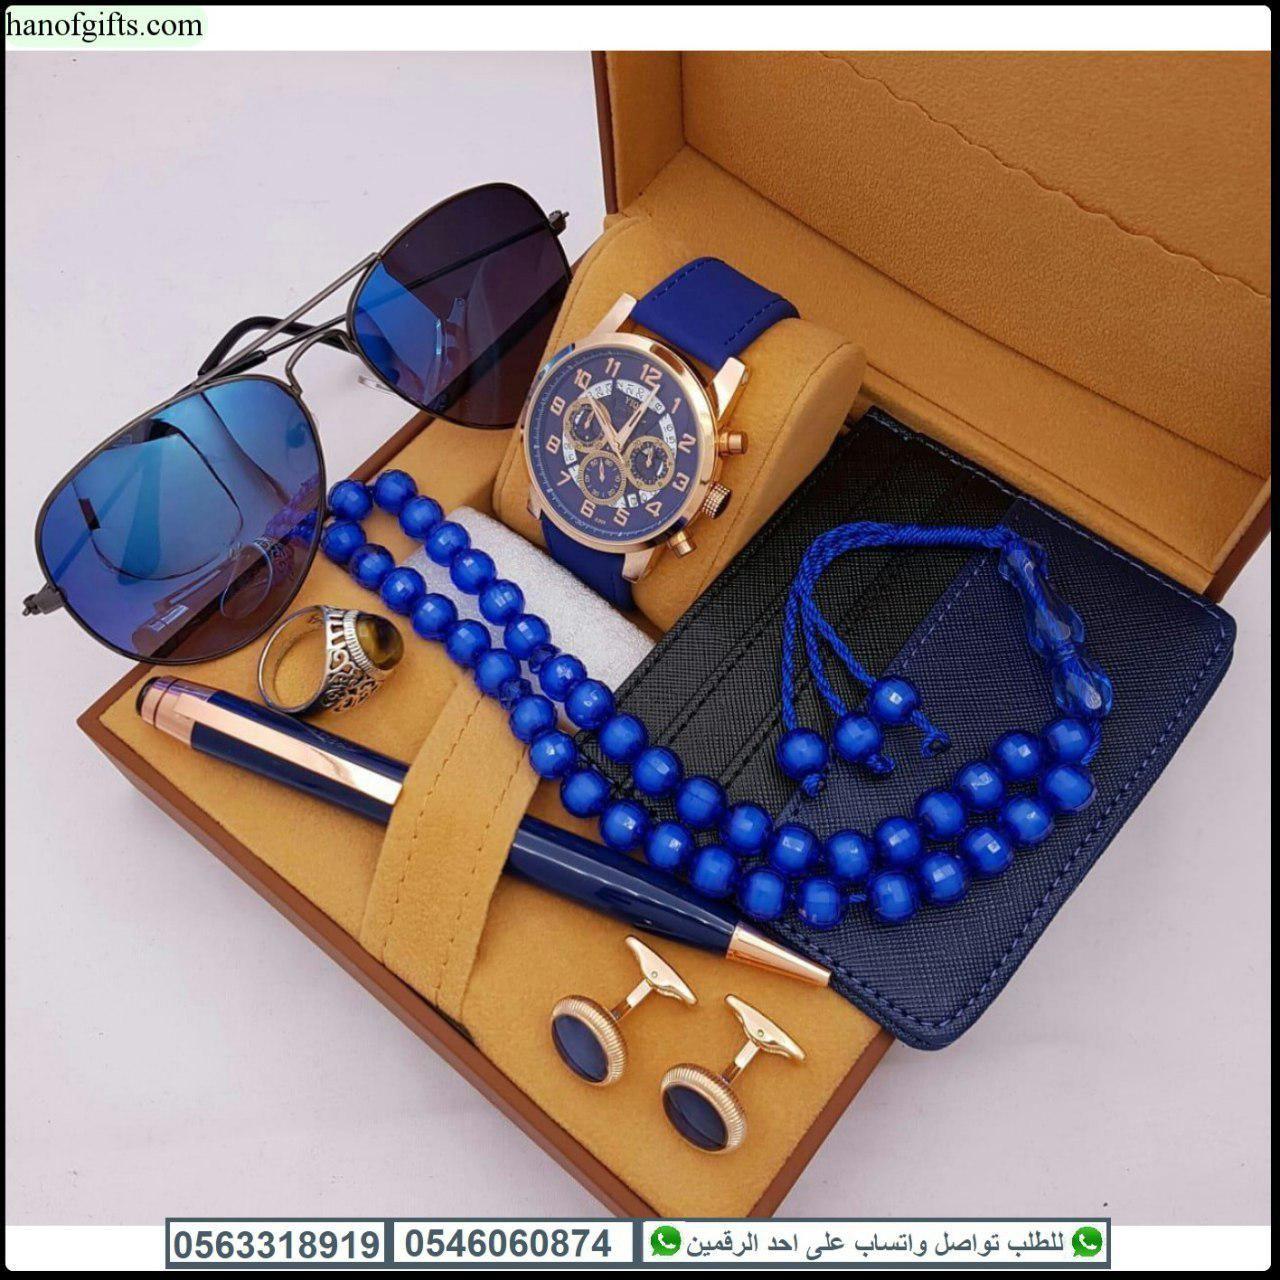 ساعات شكل مونت بلانك رجالي مع قلم و كبك و محفظة و نظارات هدايا هنوف Wearable Smart Watch Watches